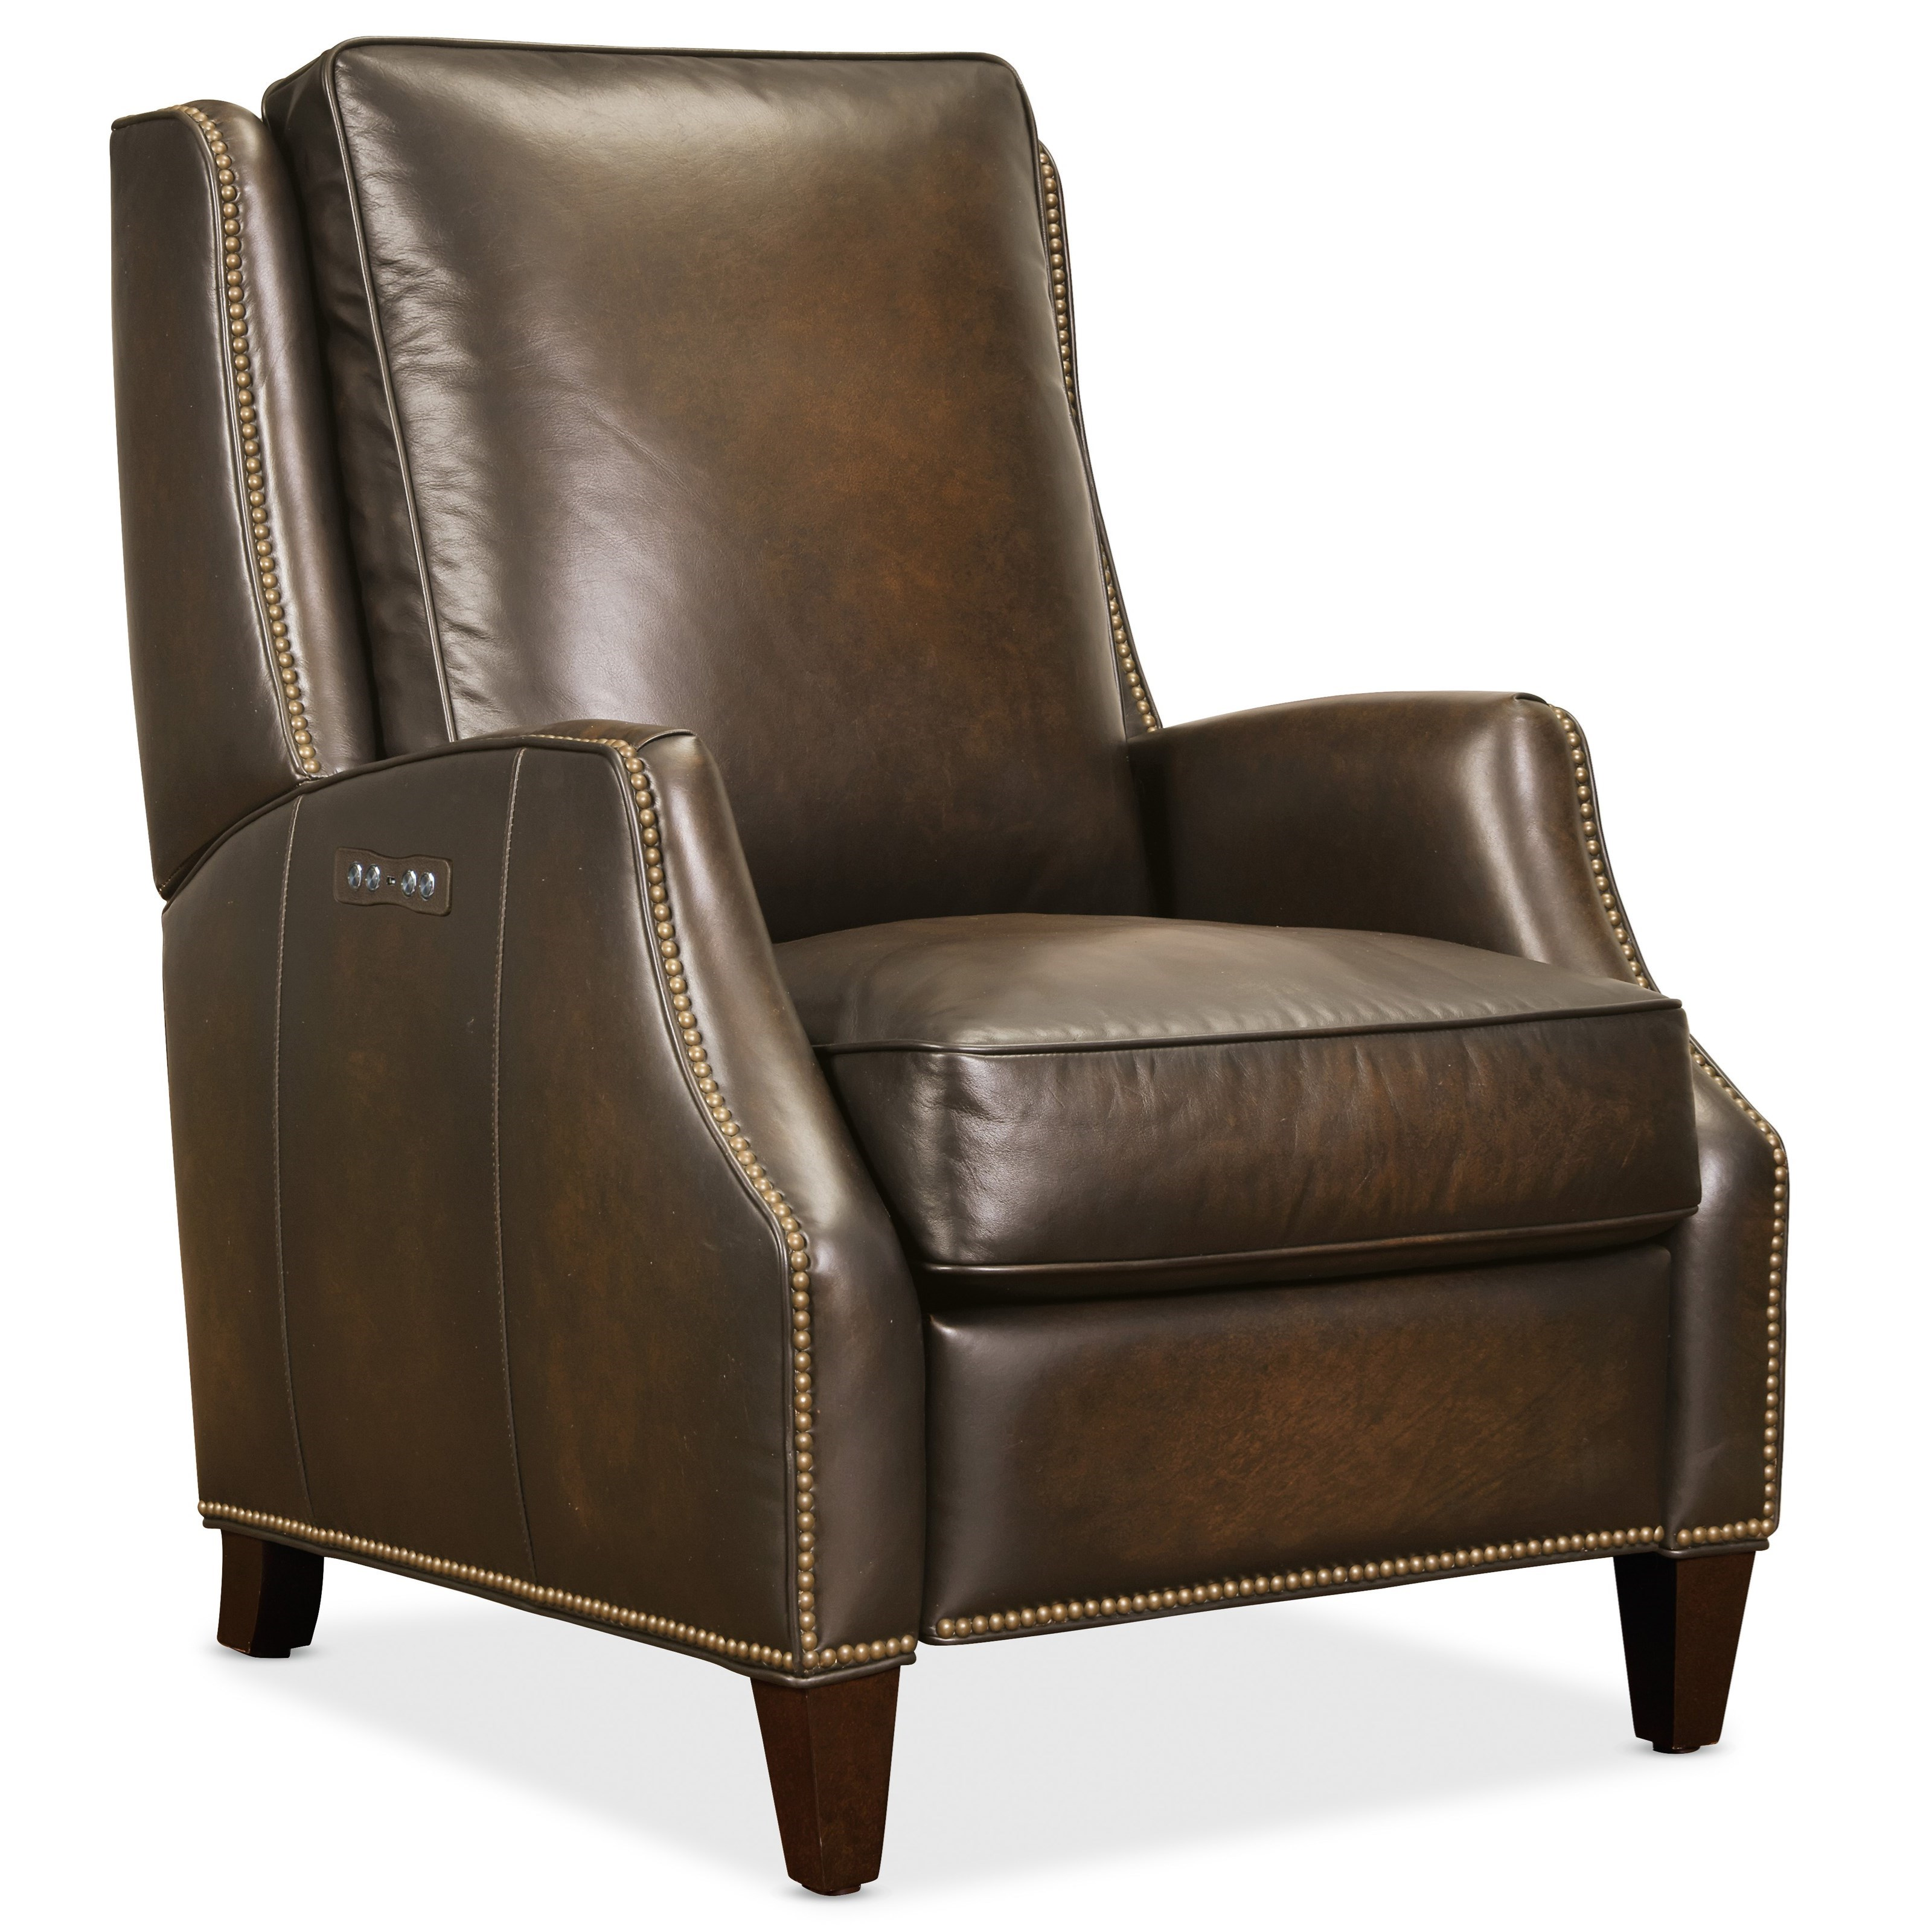 Kerley Power Recliner w/ Power Headrest by Hooker Furniture at Baer's Furniture